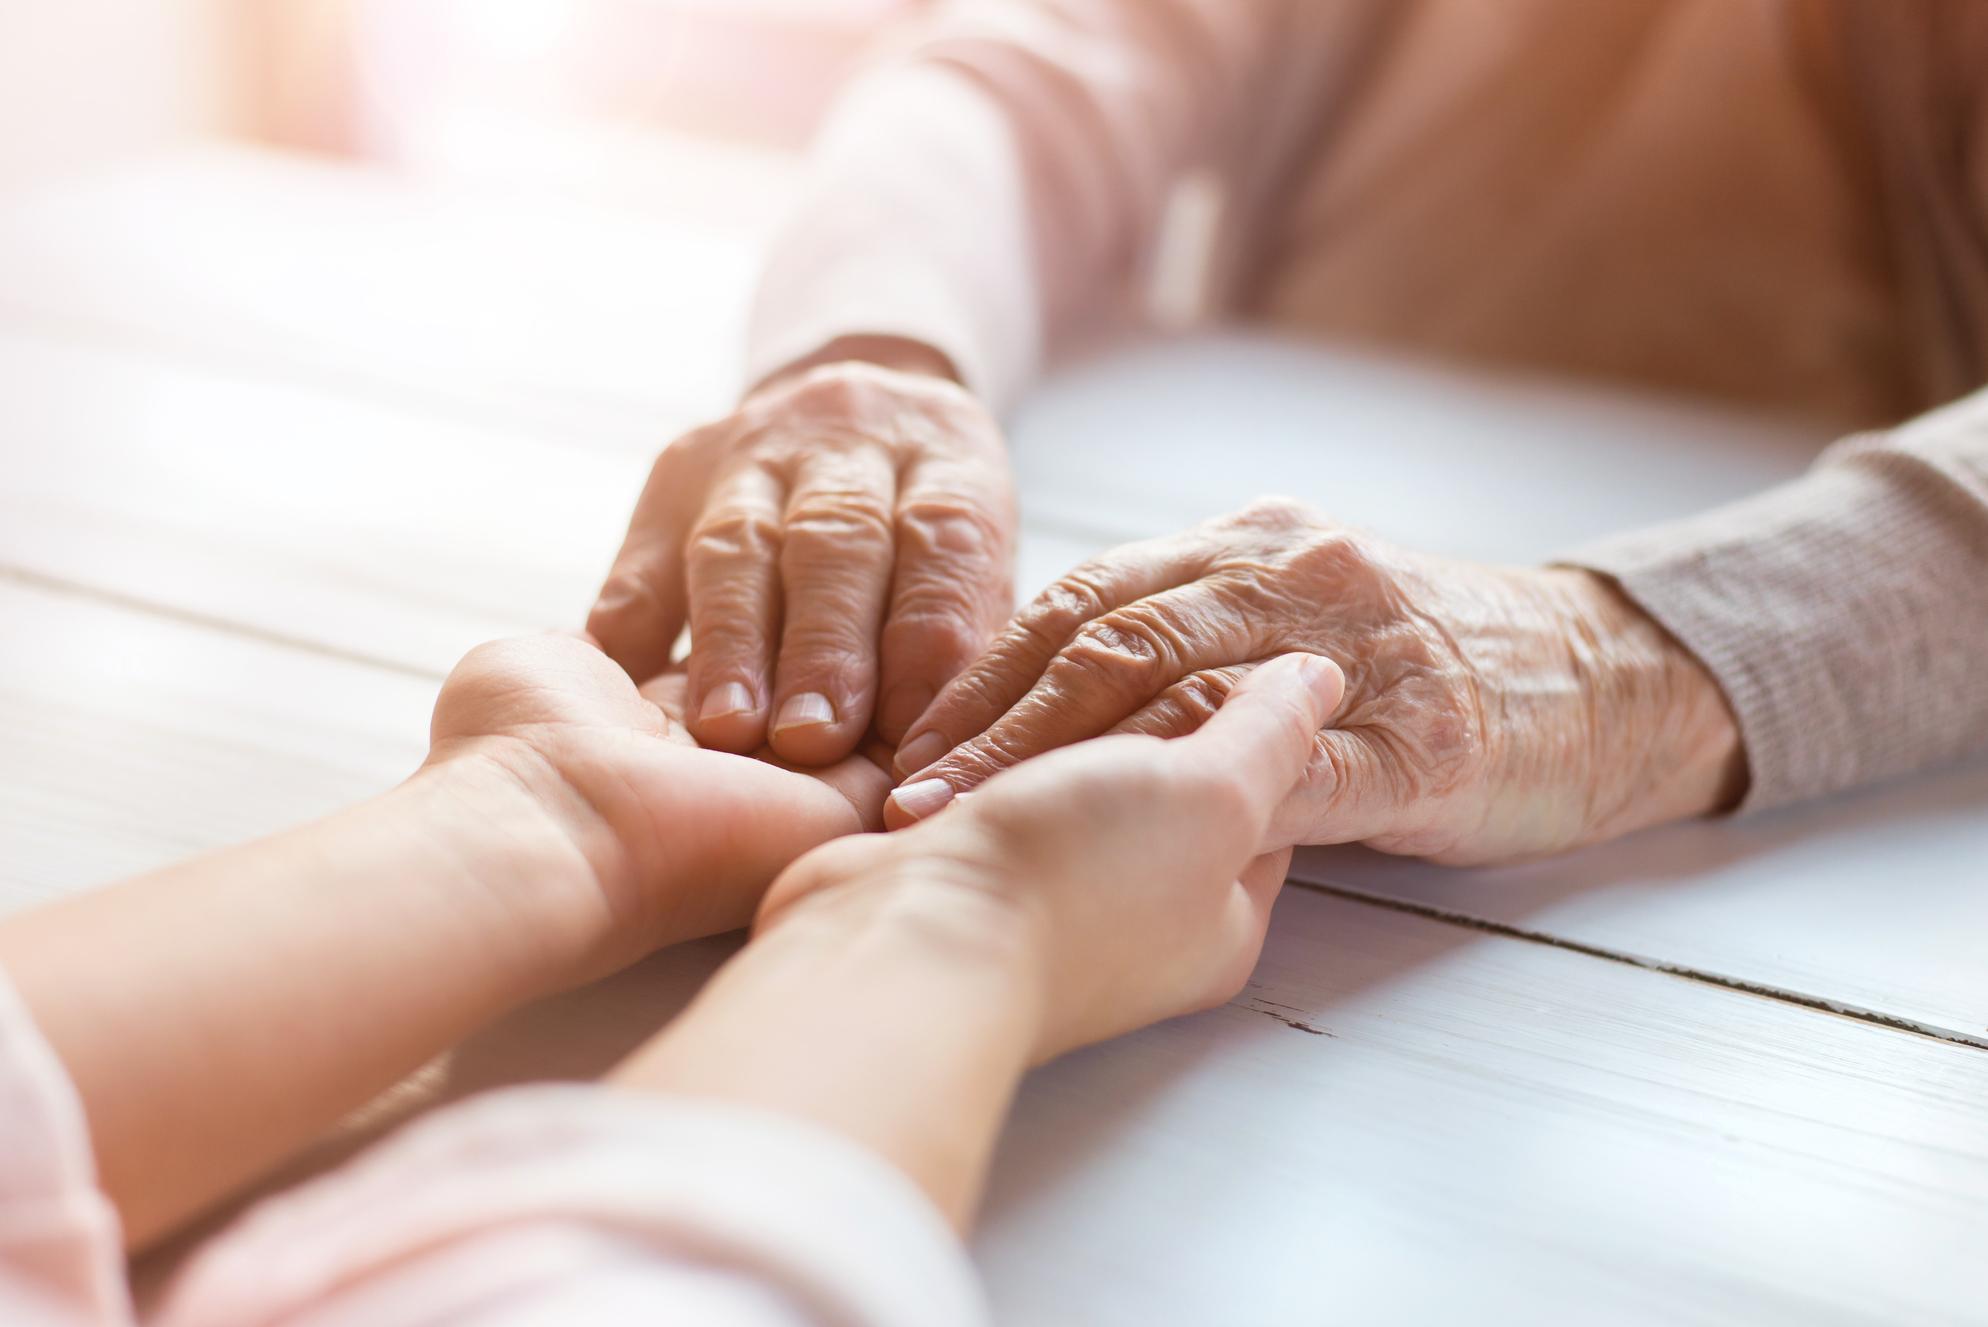 Grandma hand hold